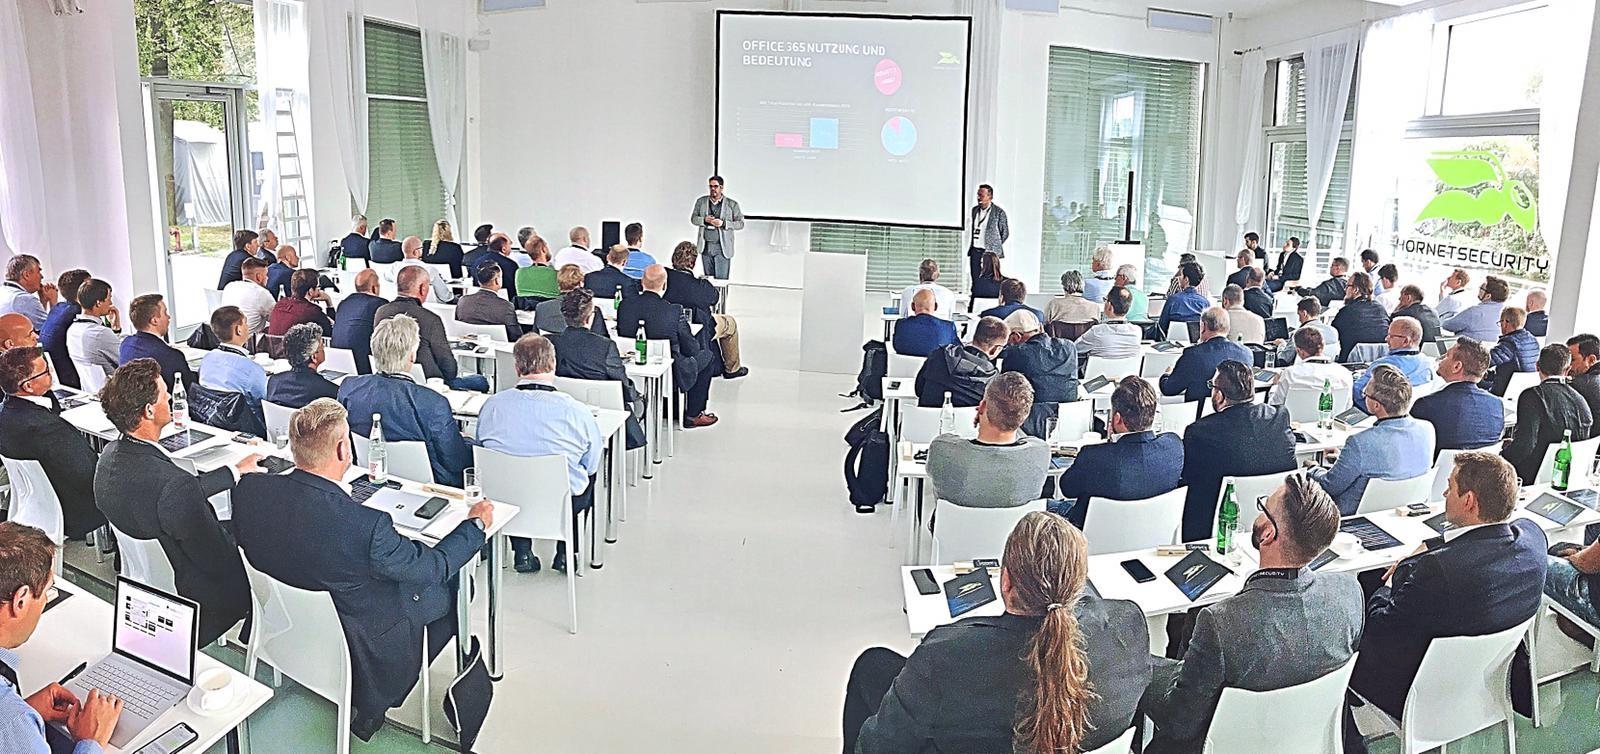 Daniel Blank und Daniel Hofmann beim Hornetsecurity Partnerdialog 2019